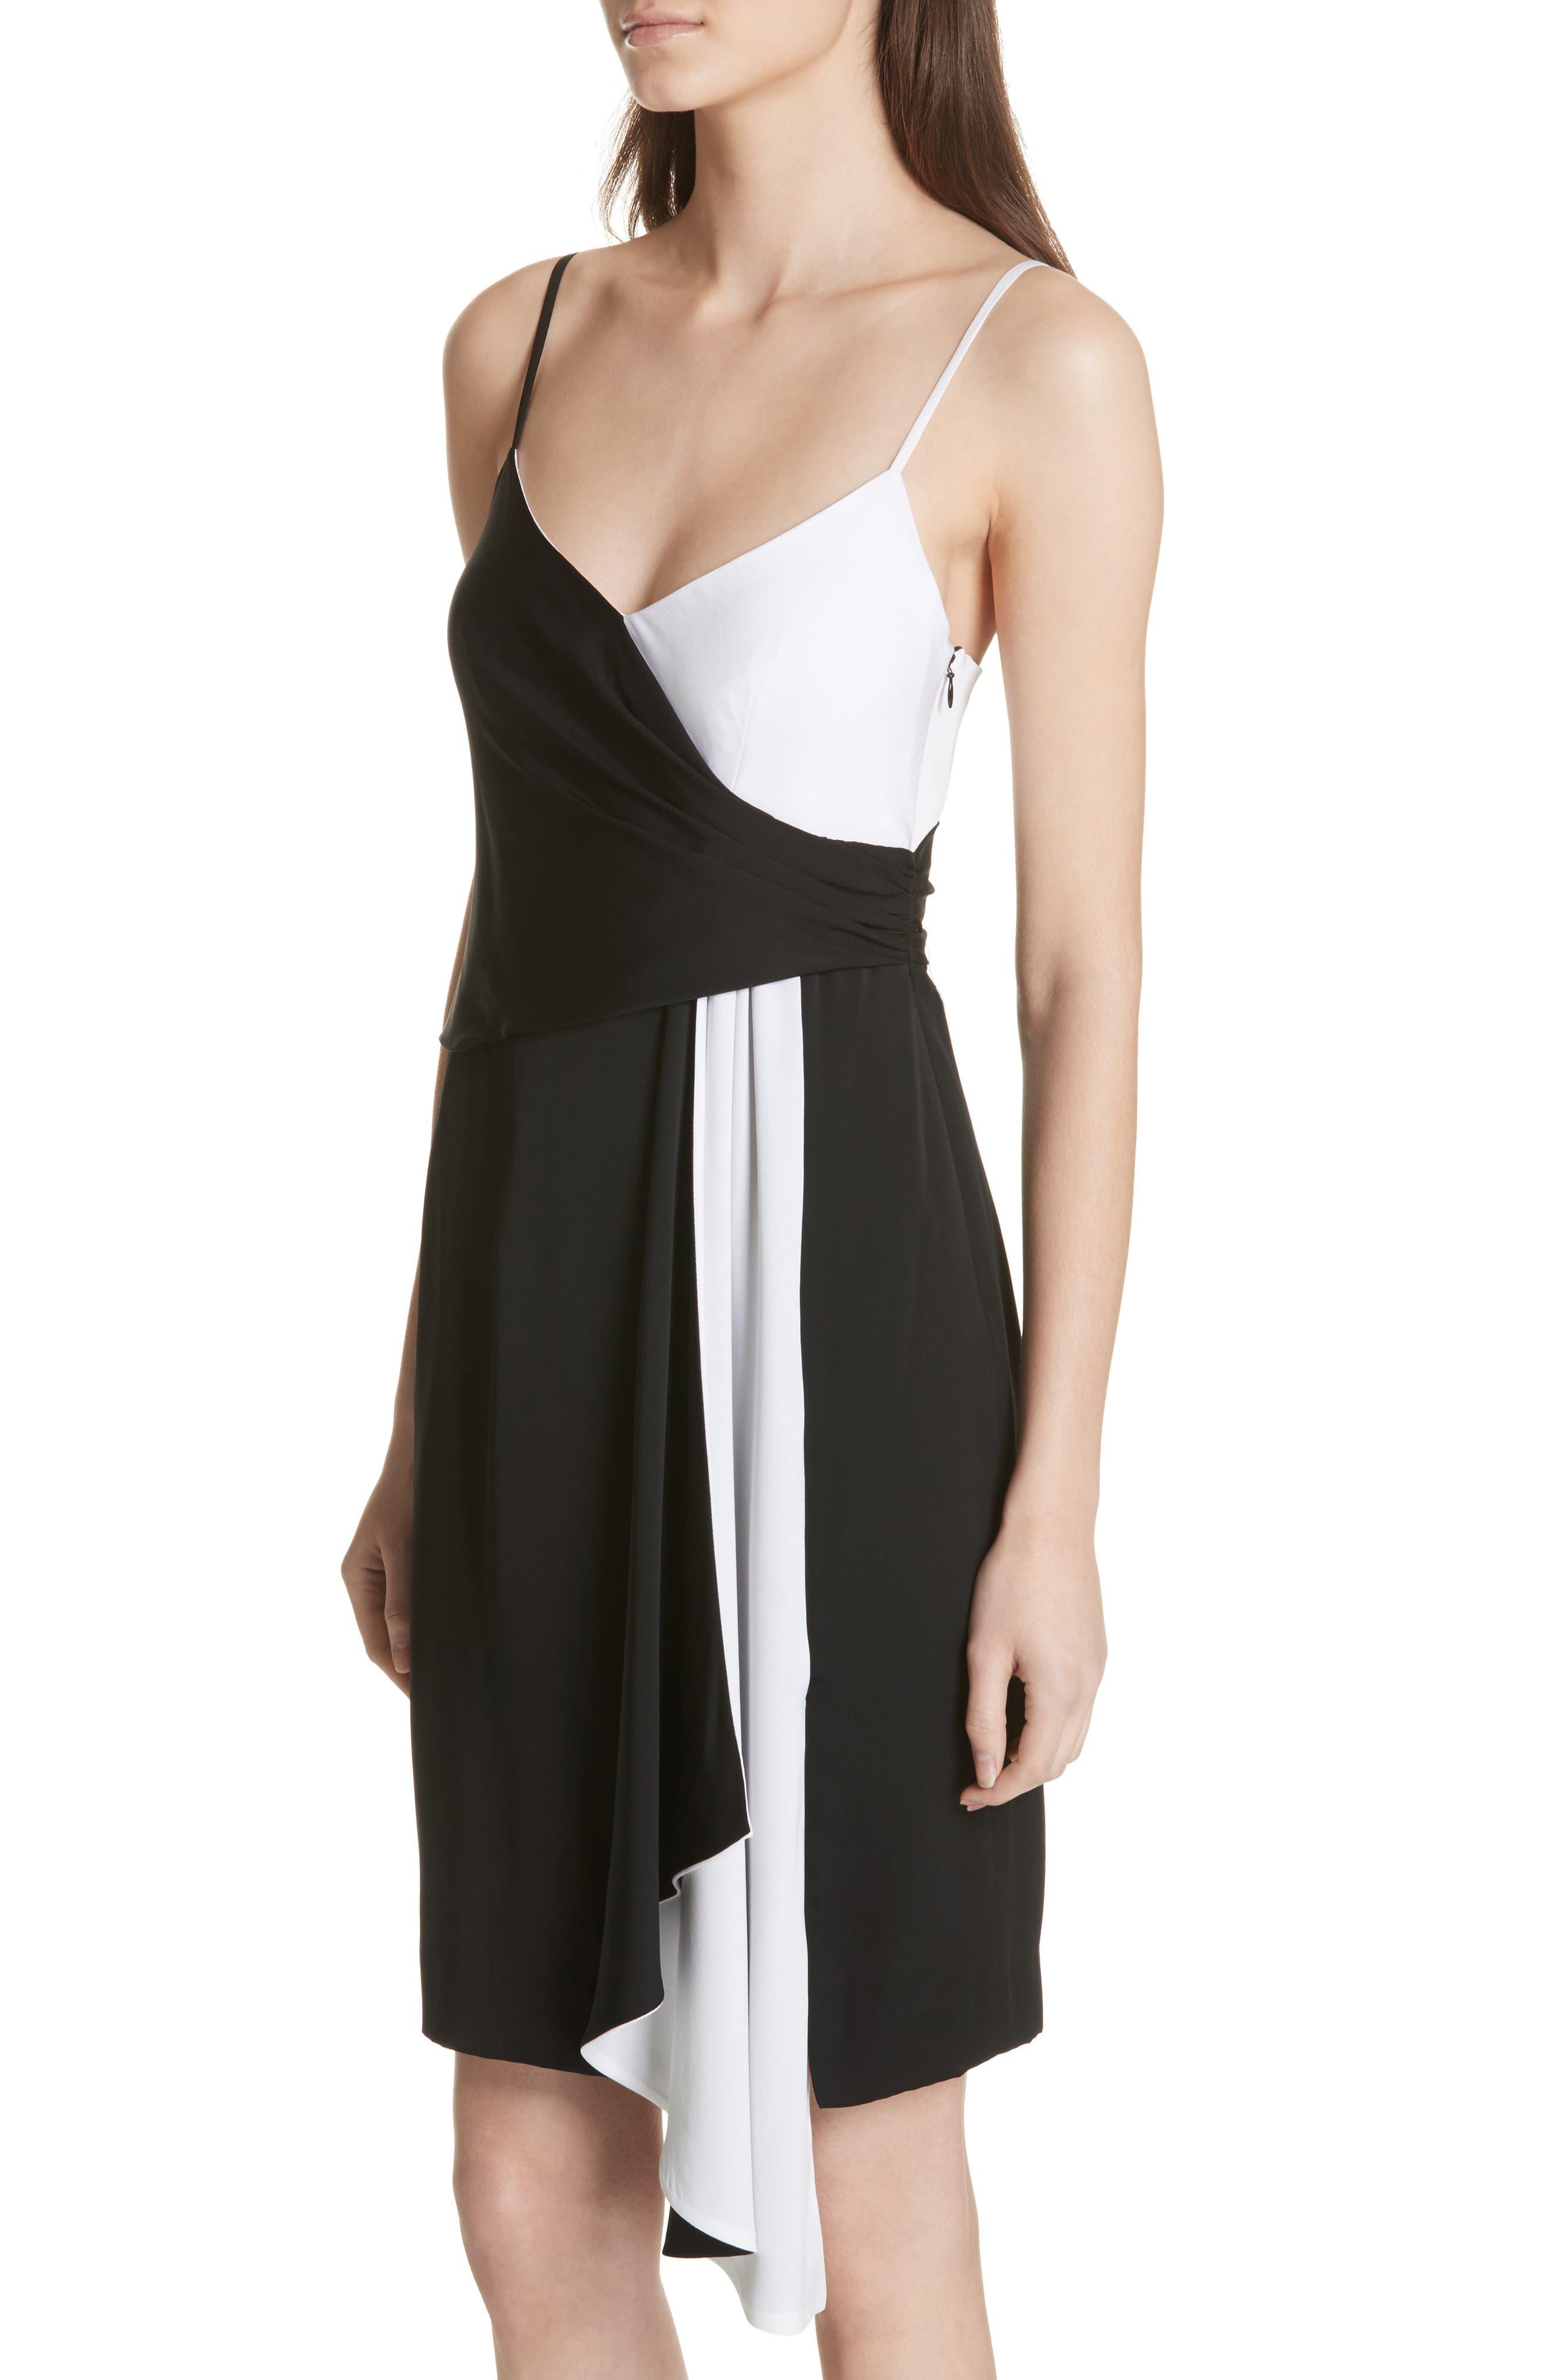 Cindy Two-Tone Stretch Silk Dress,                             Alternate thumbnail 4, color,                             006